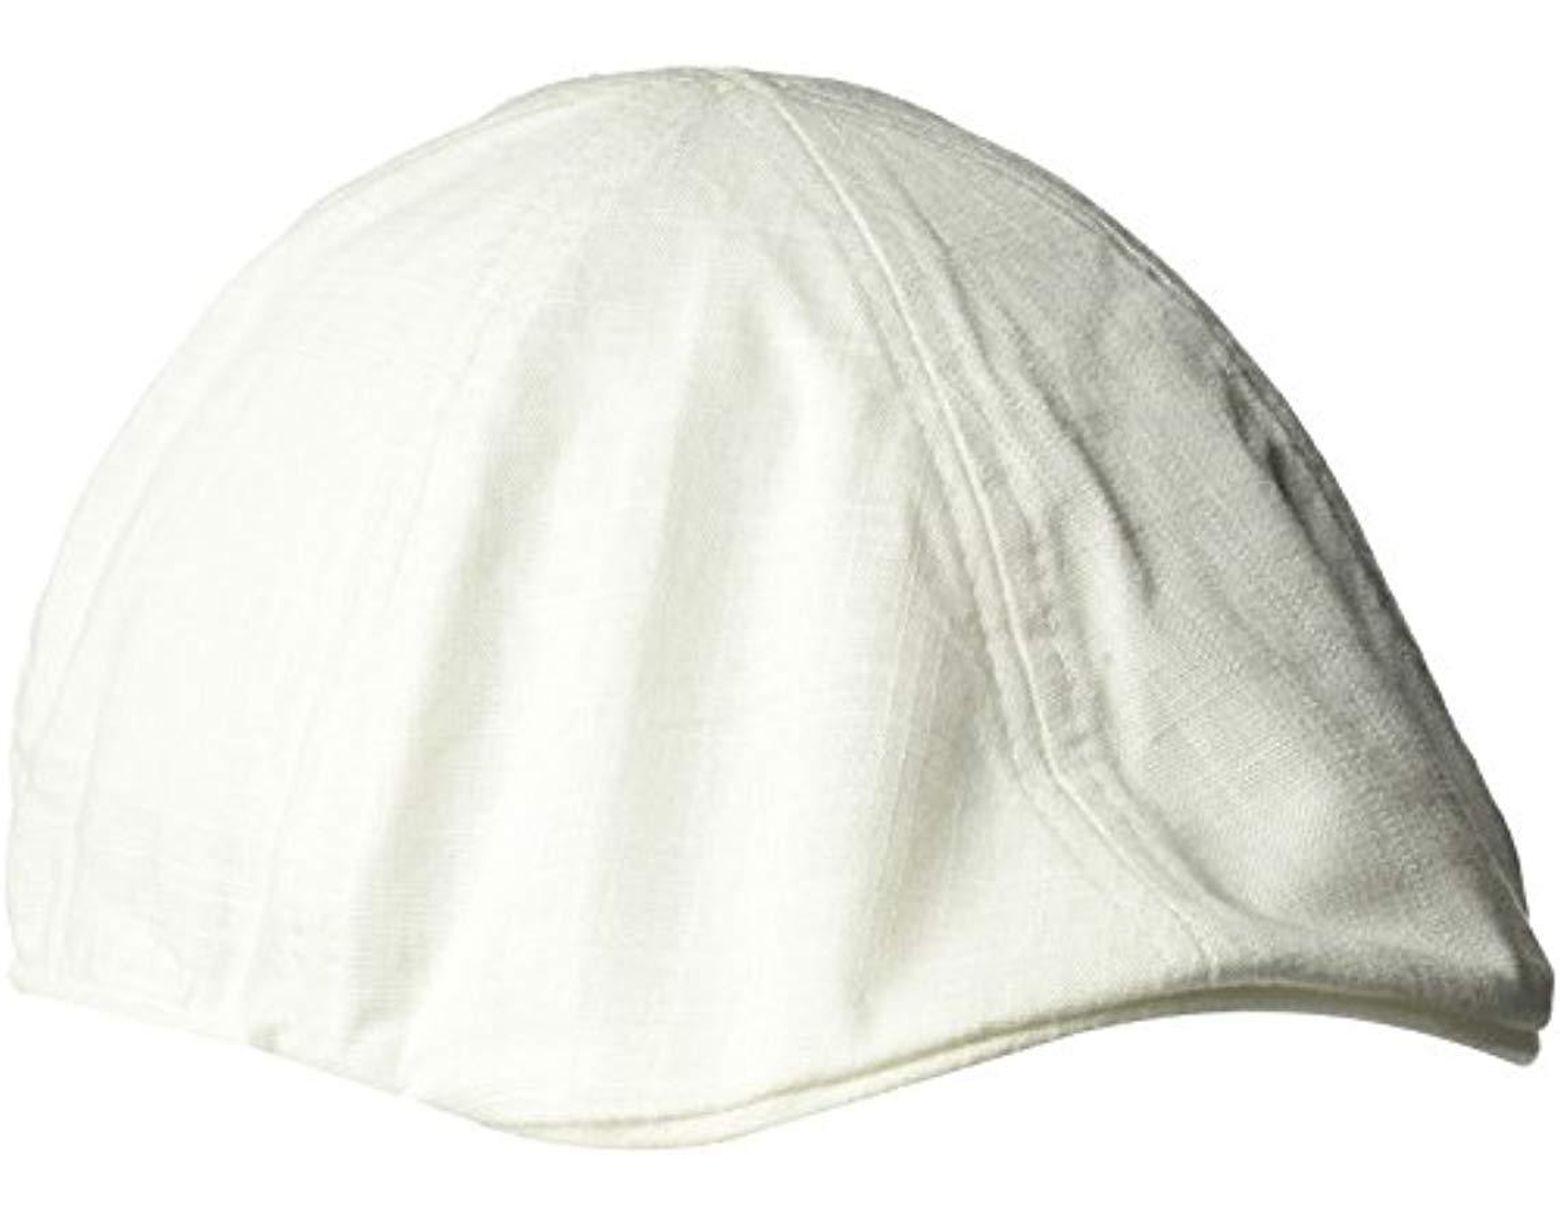 15c020eb Sean John Herringbone Texture 6 Panel Newsboy Cap, Ivy in White for Men -  Lyst